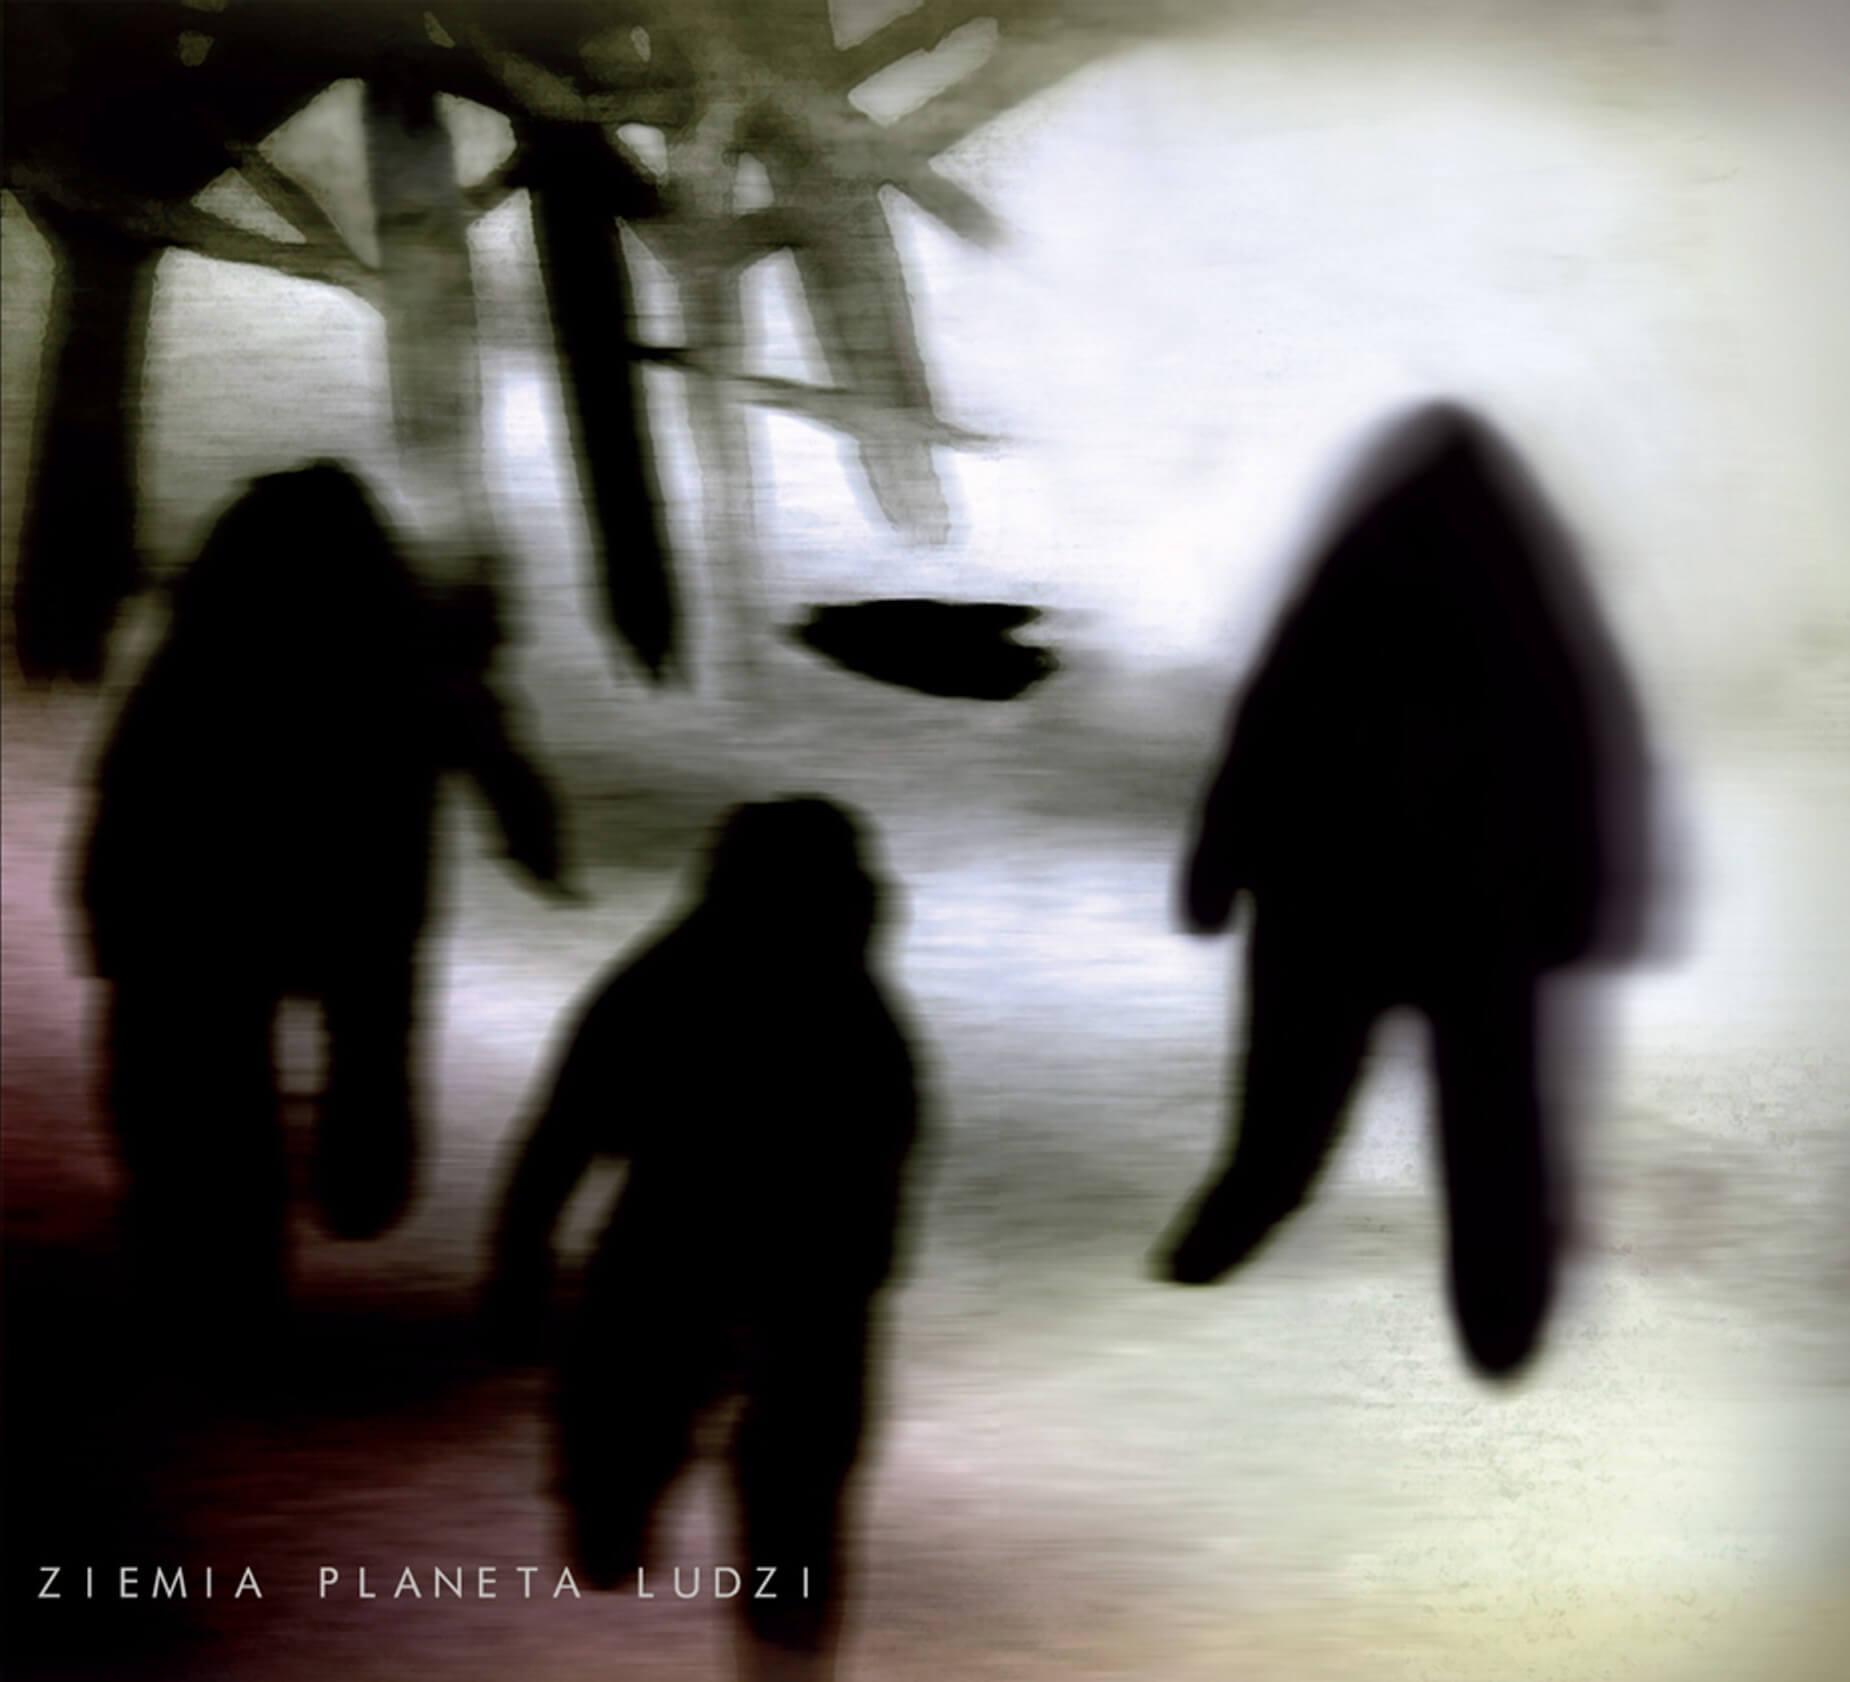 Ziemia Planeta Ludzi: s/t